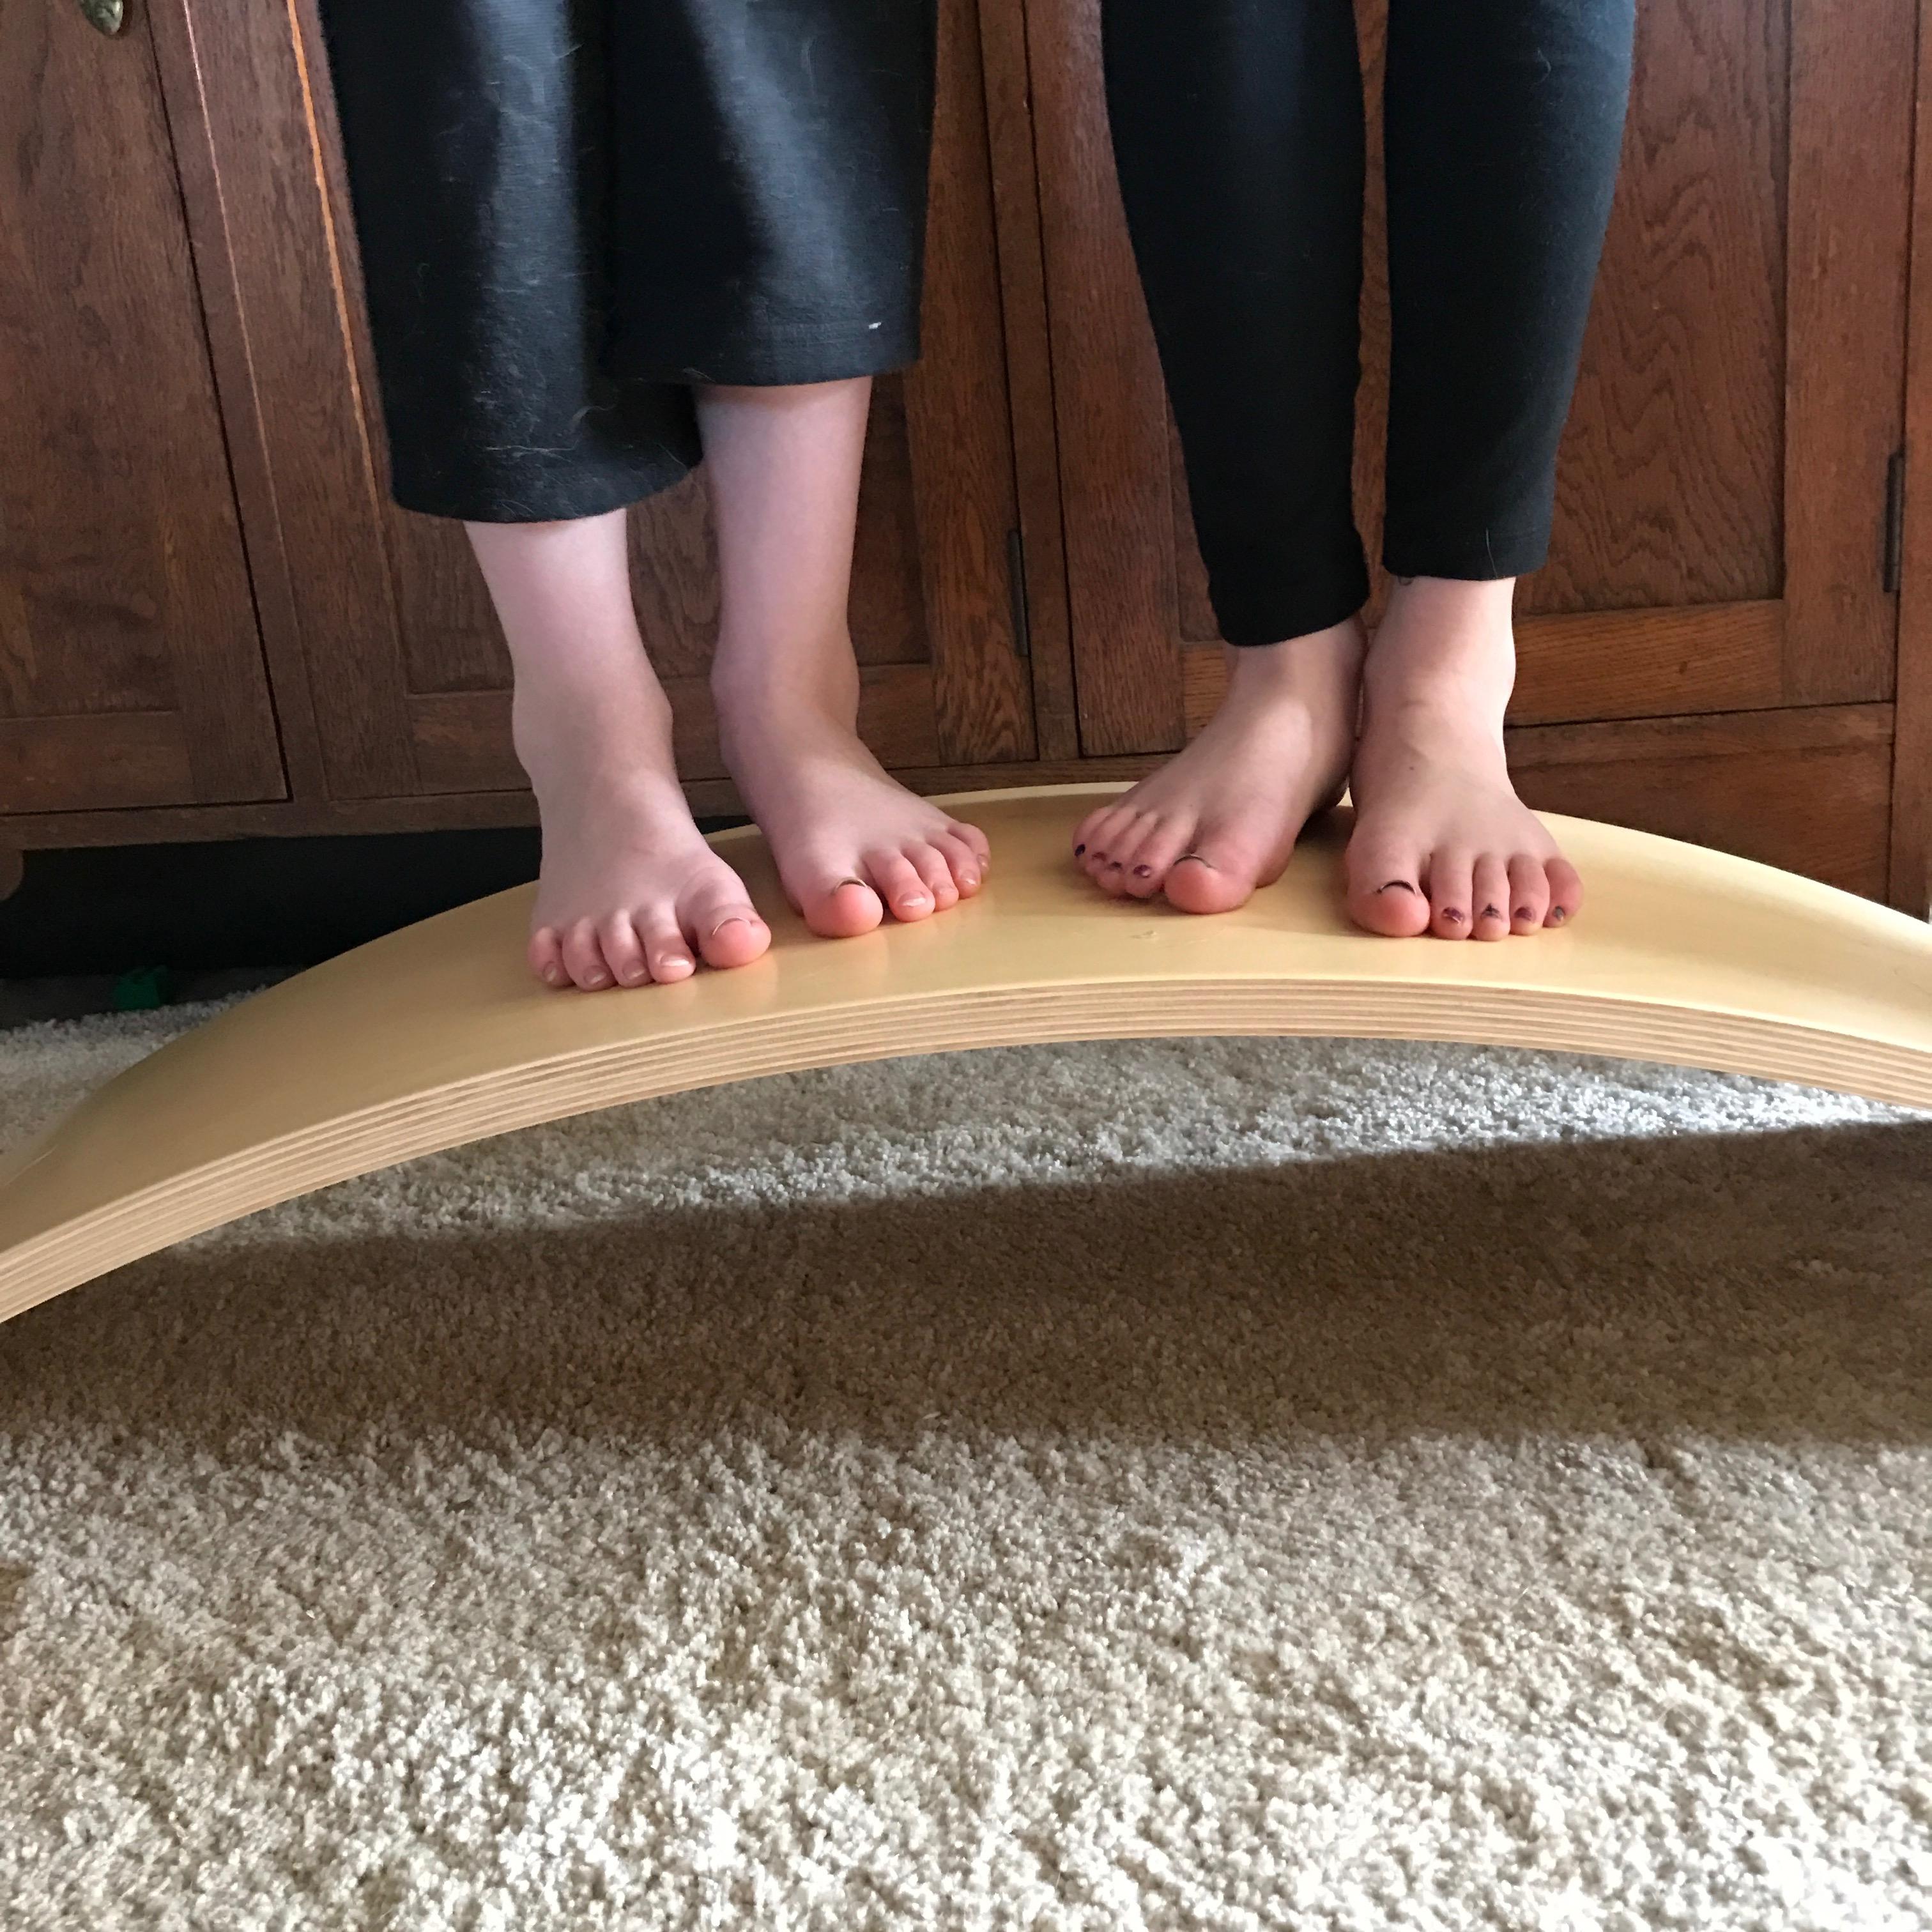 Way of the Cactus sway board